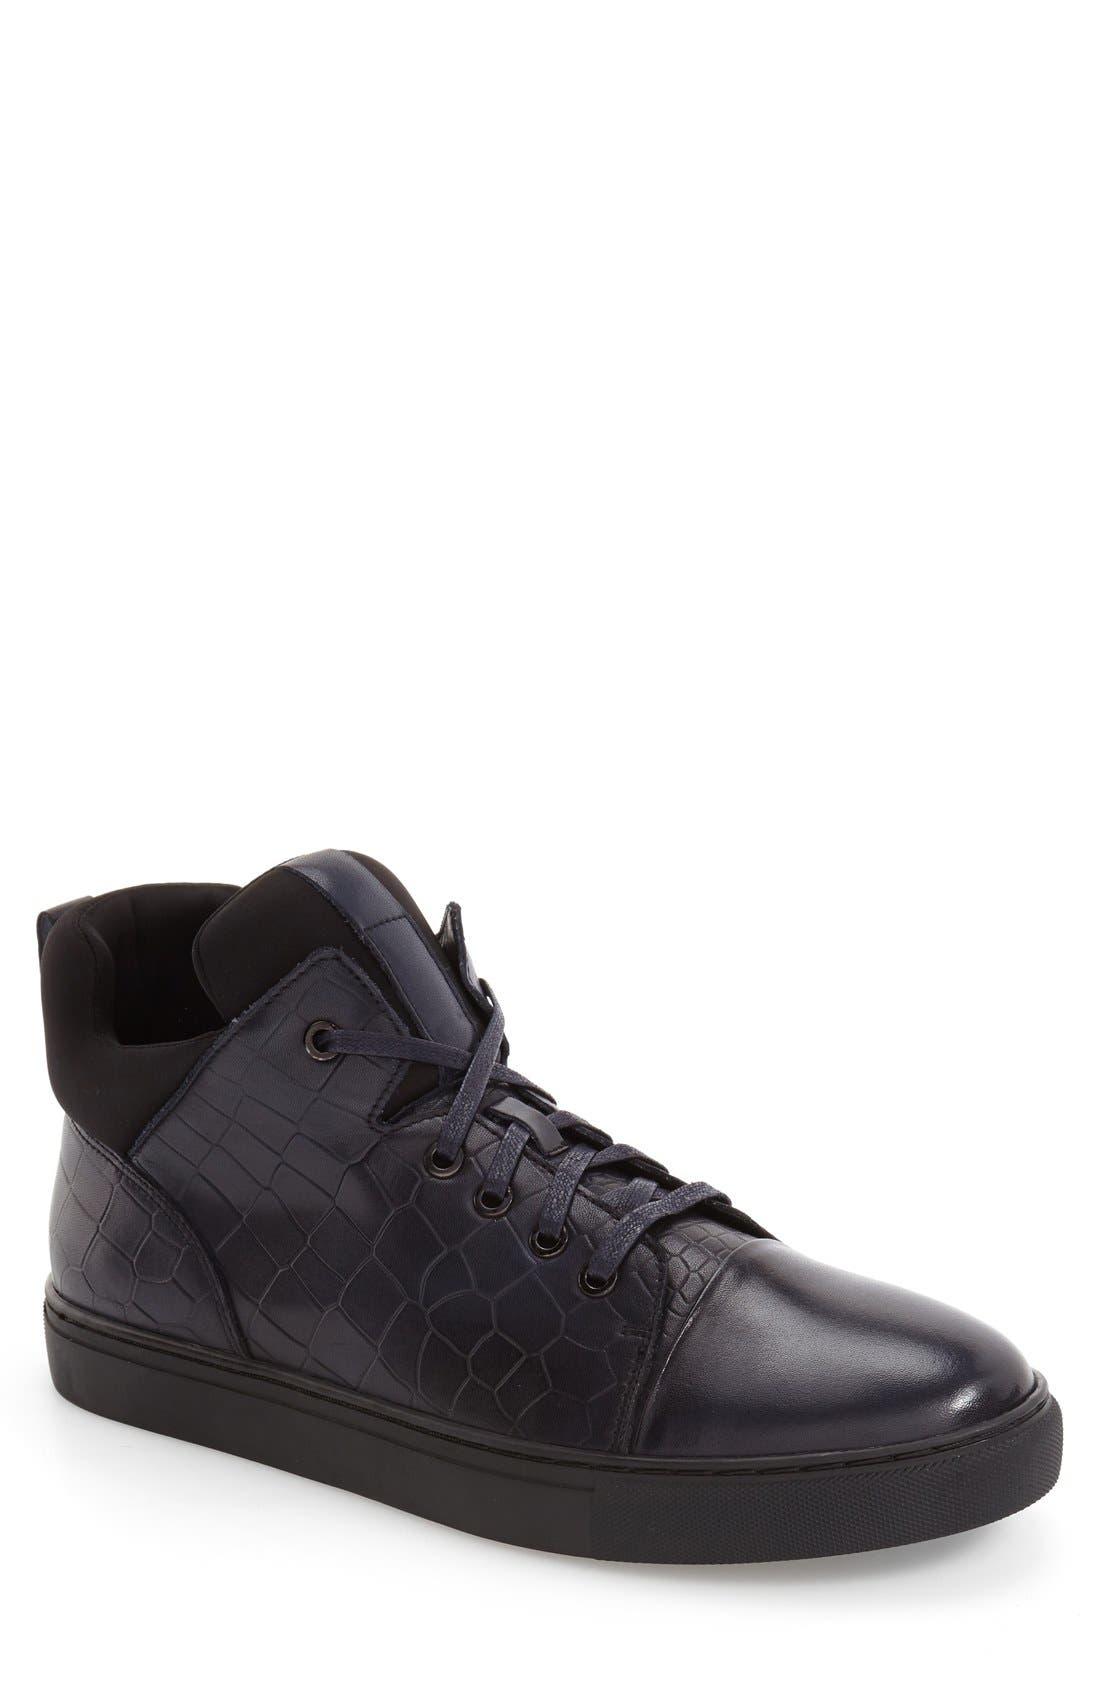 Zanzara 'Remix' High Top Sneaker (Men)